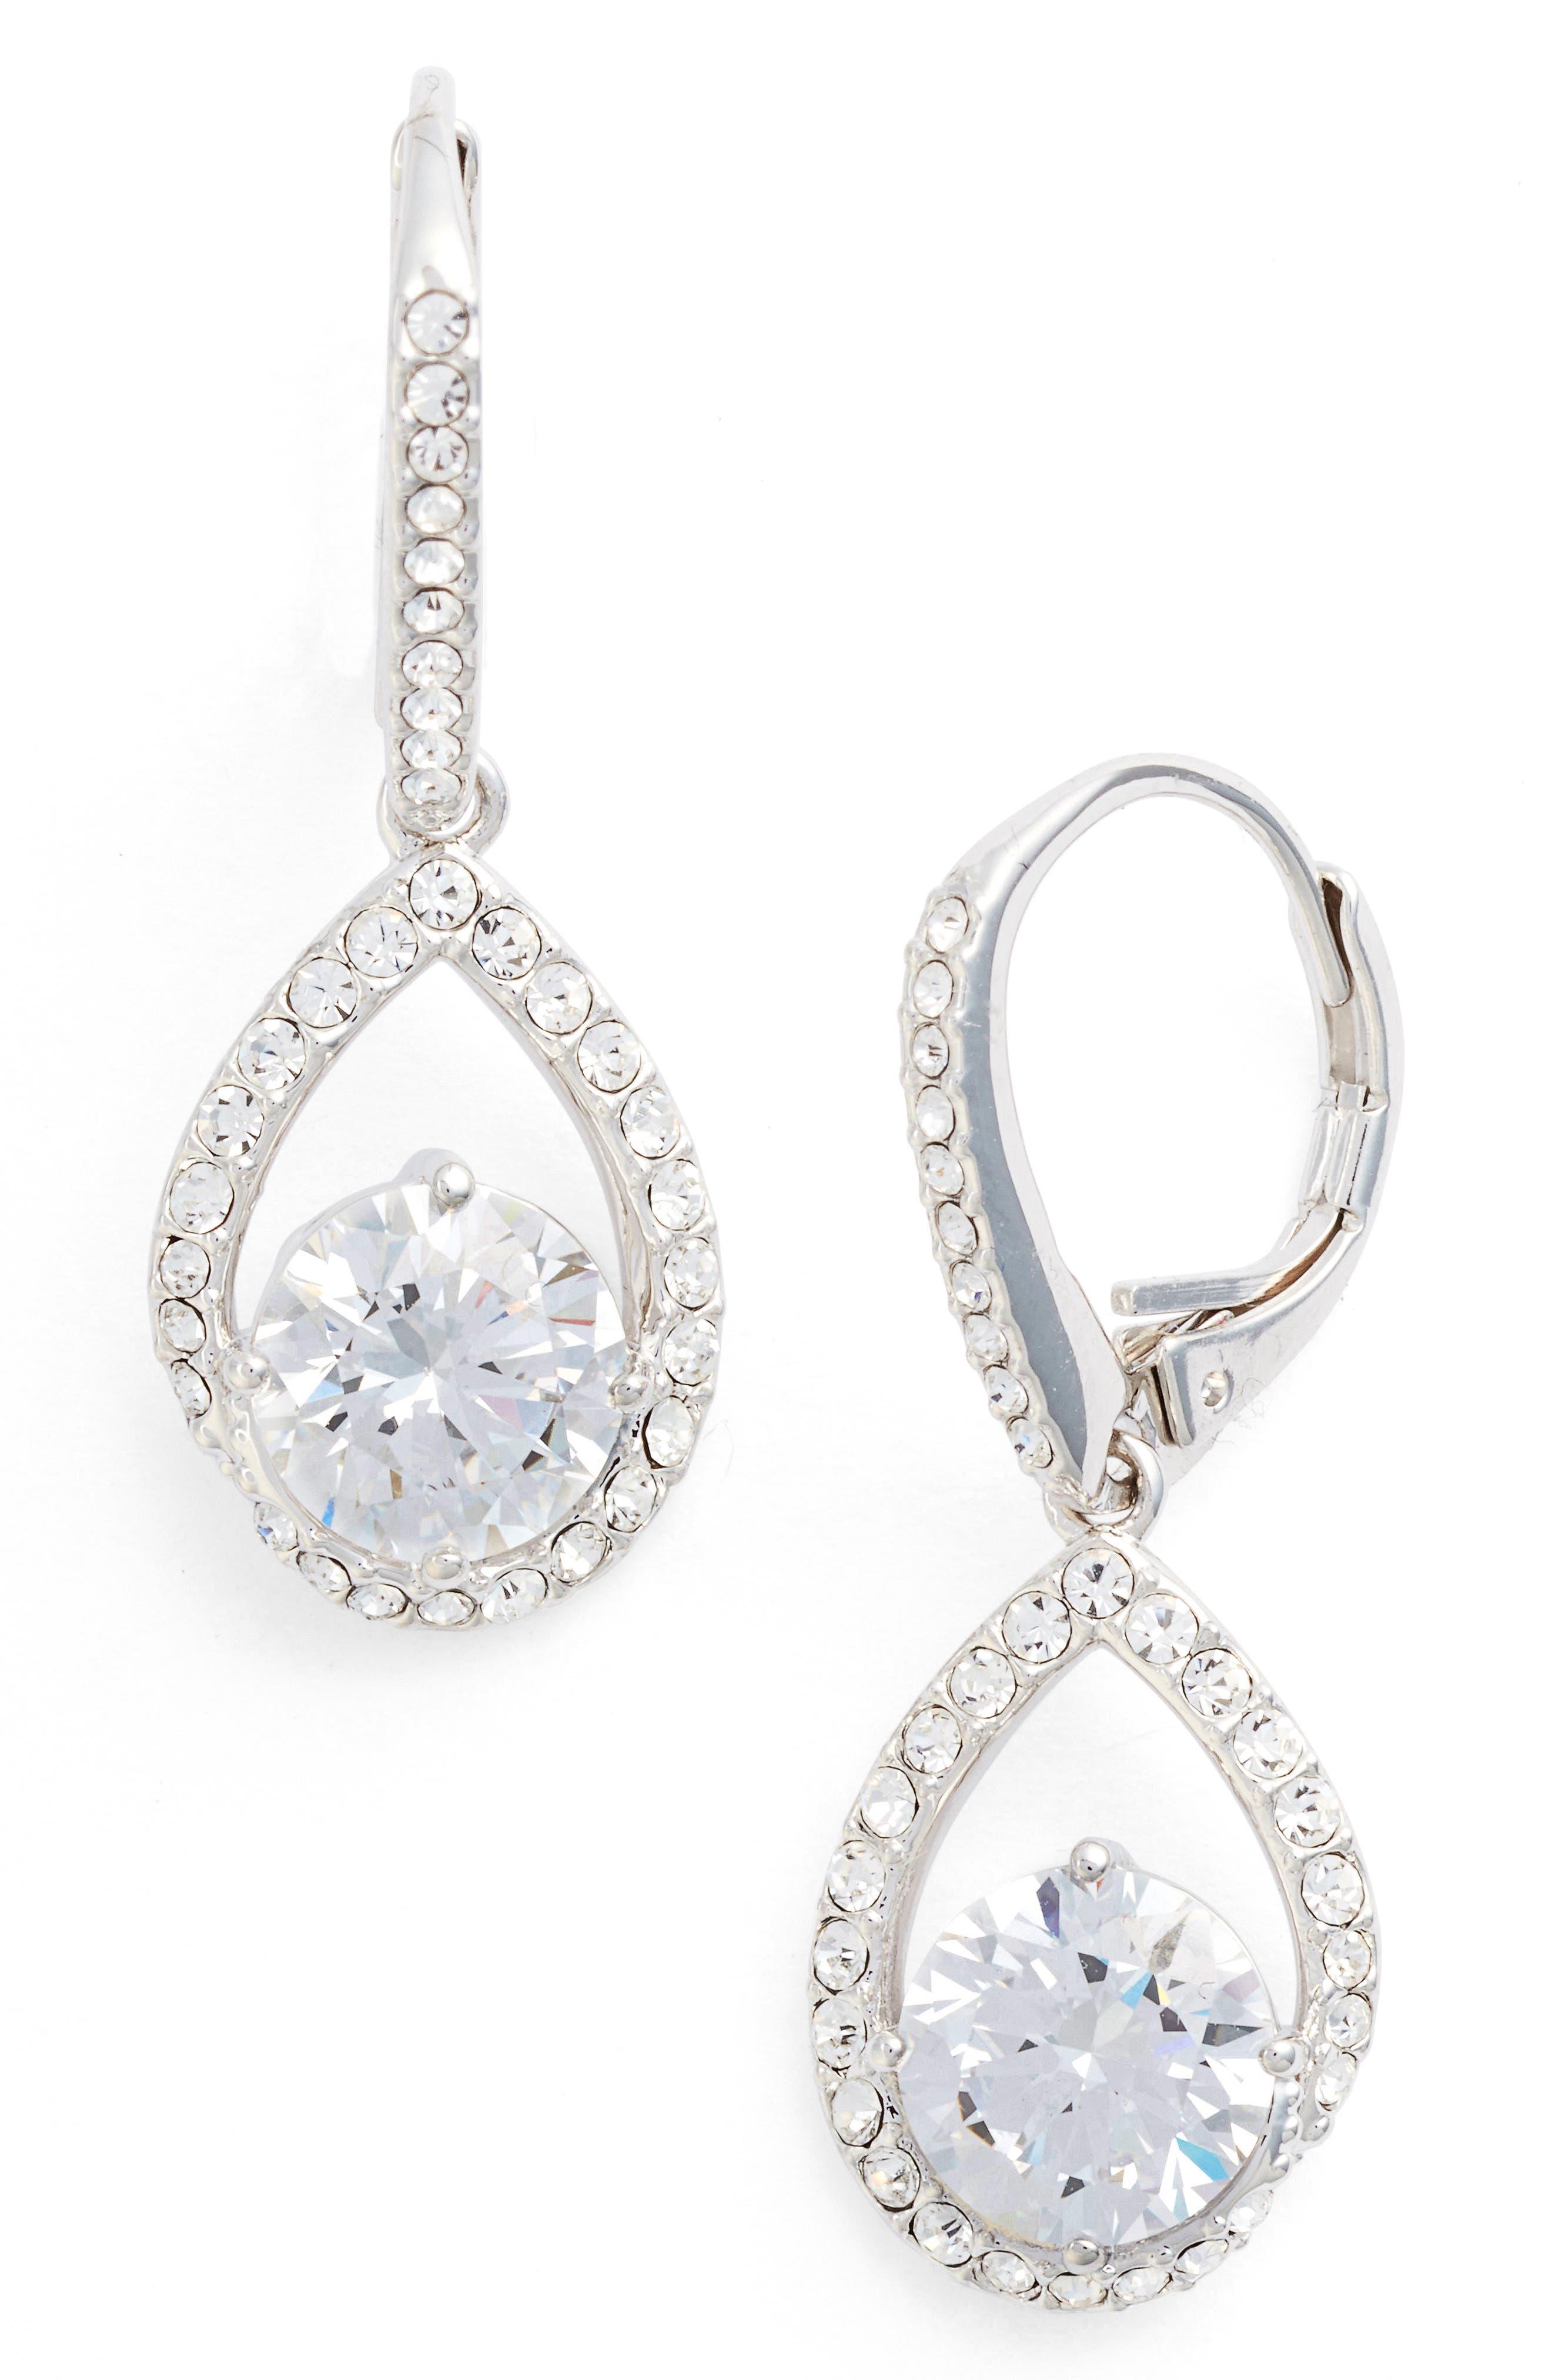 Cubic Zirconia Pear Drop Earrings,                             Main thumbnail 1, color,                             Silver